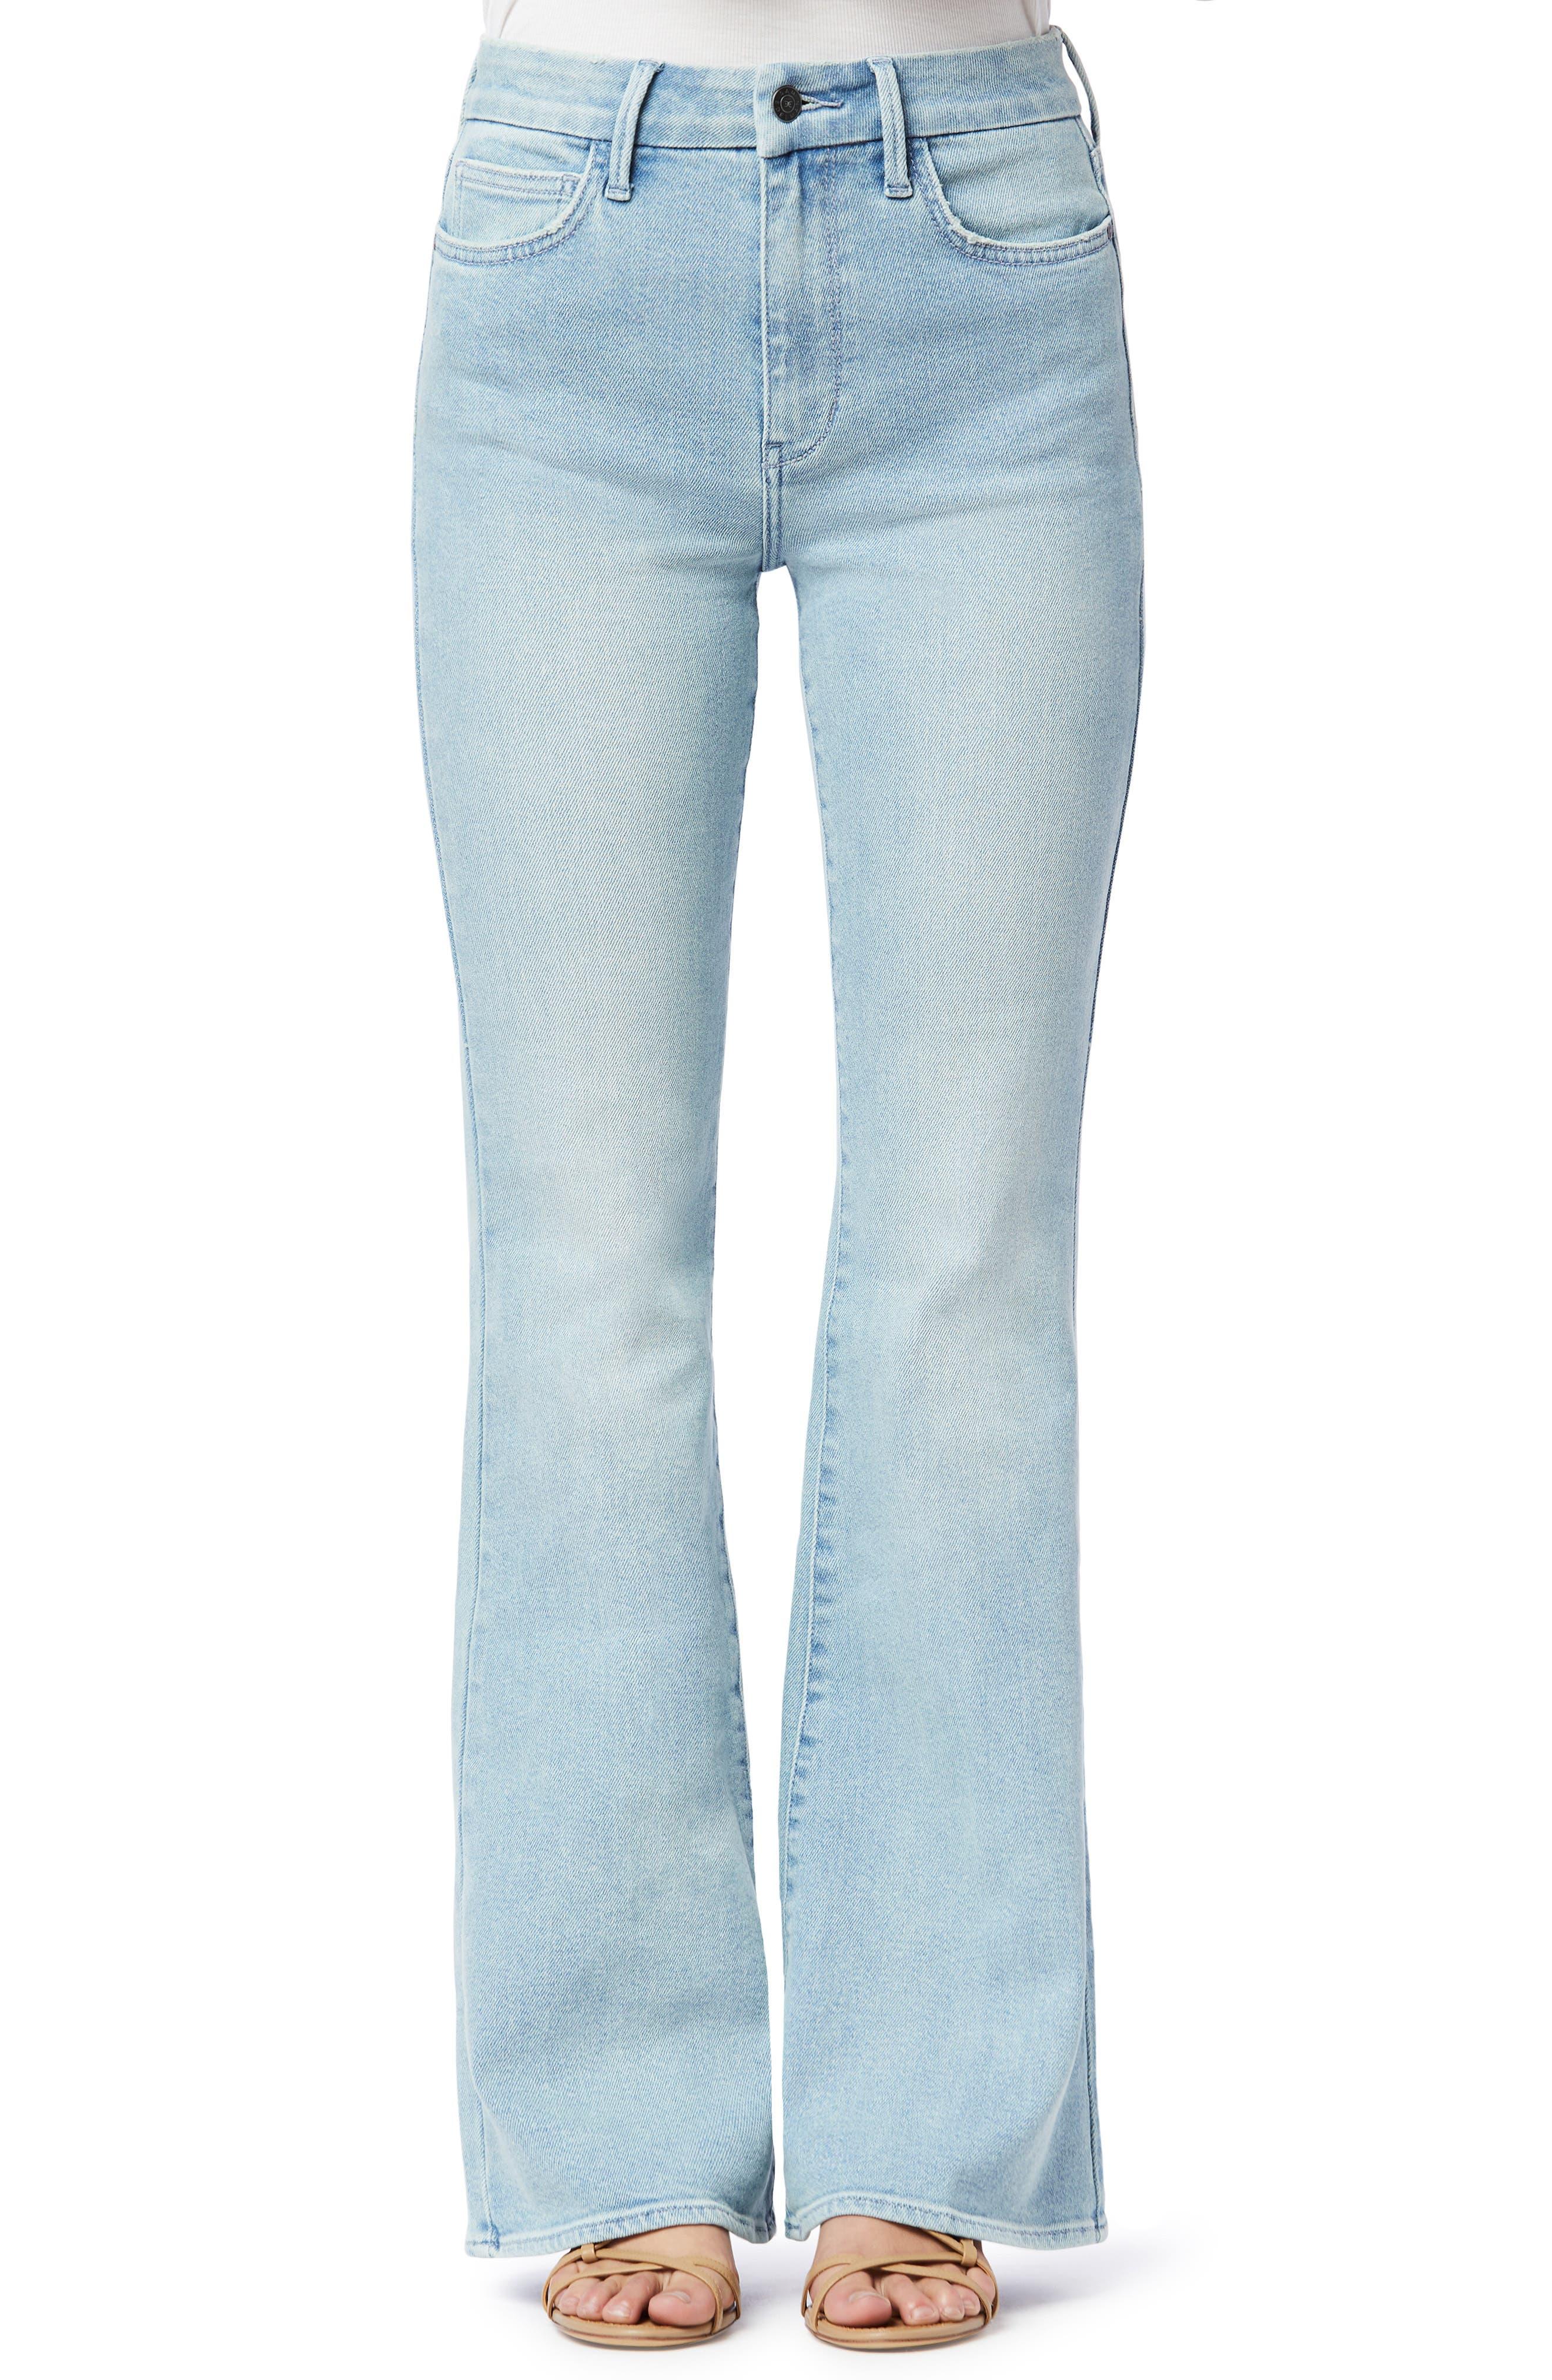 Women's Sam Edelman The Stiletto High Waist Flare Leg Jeans